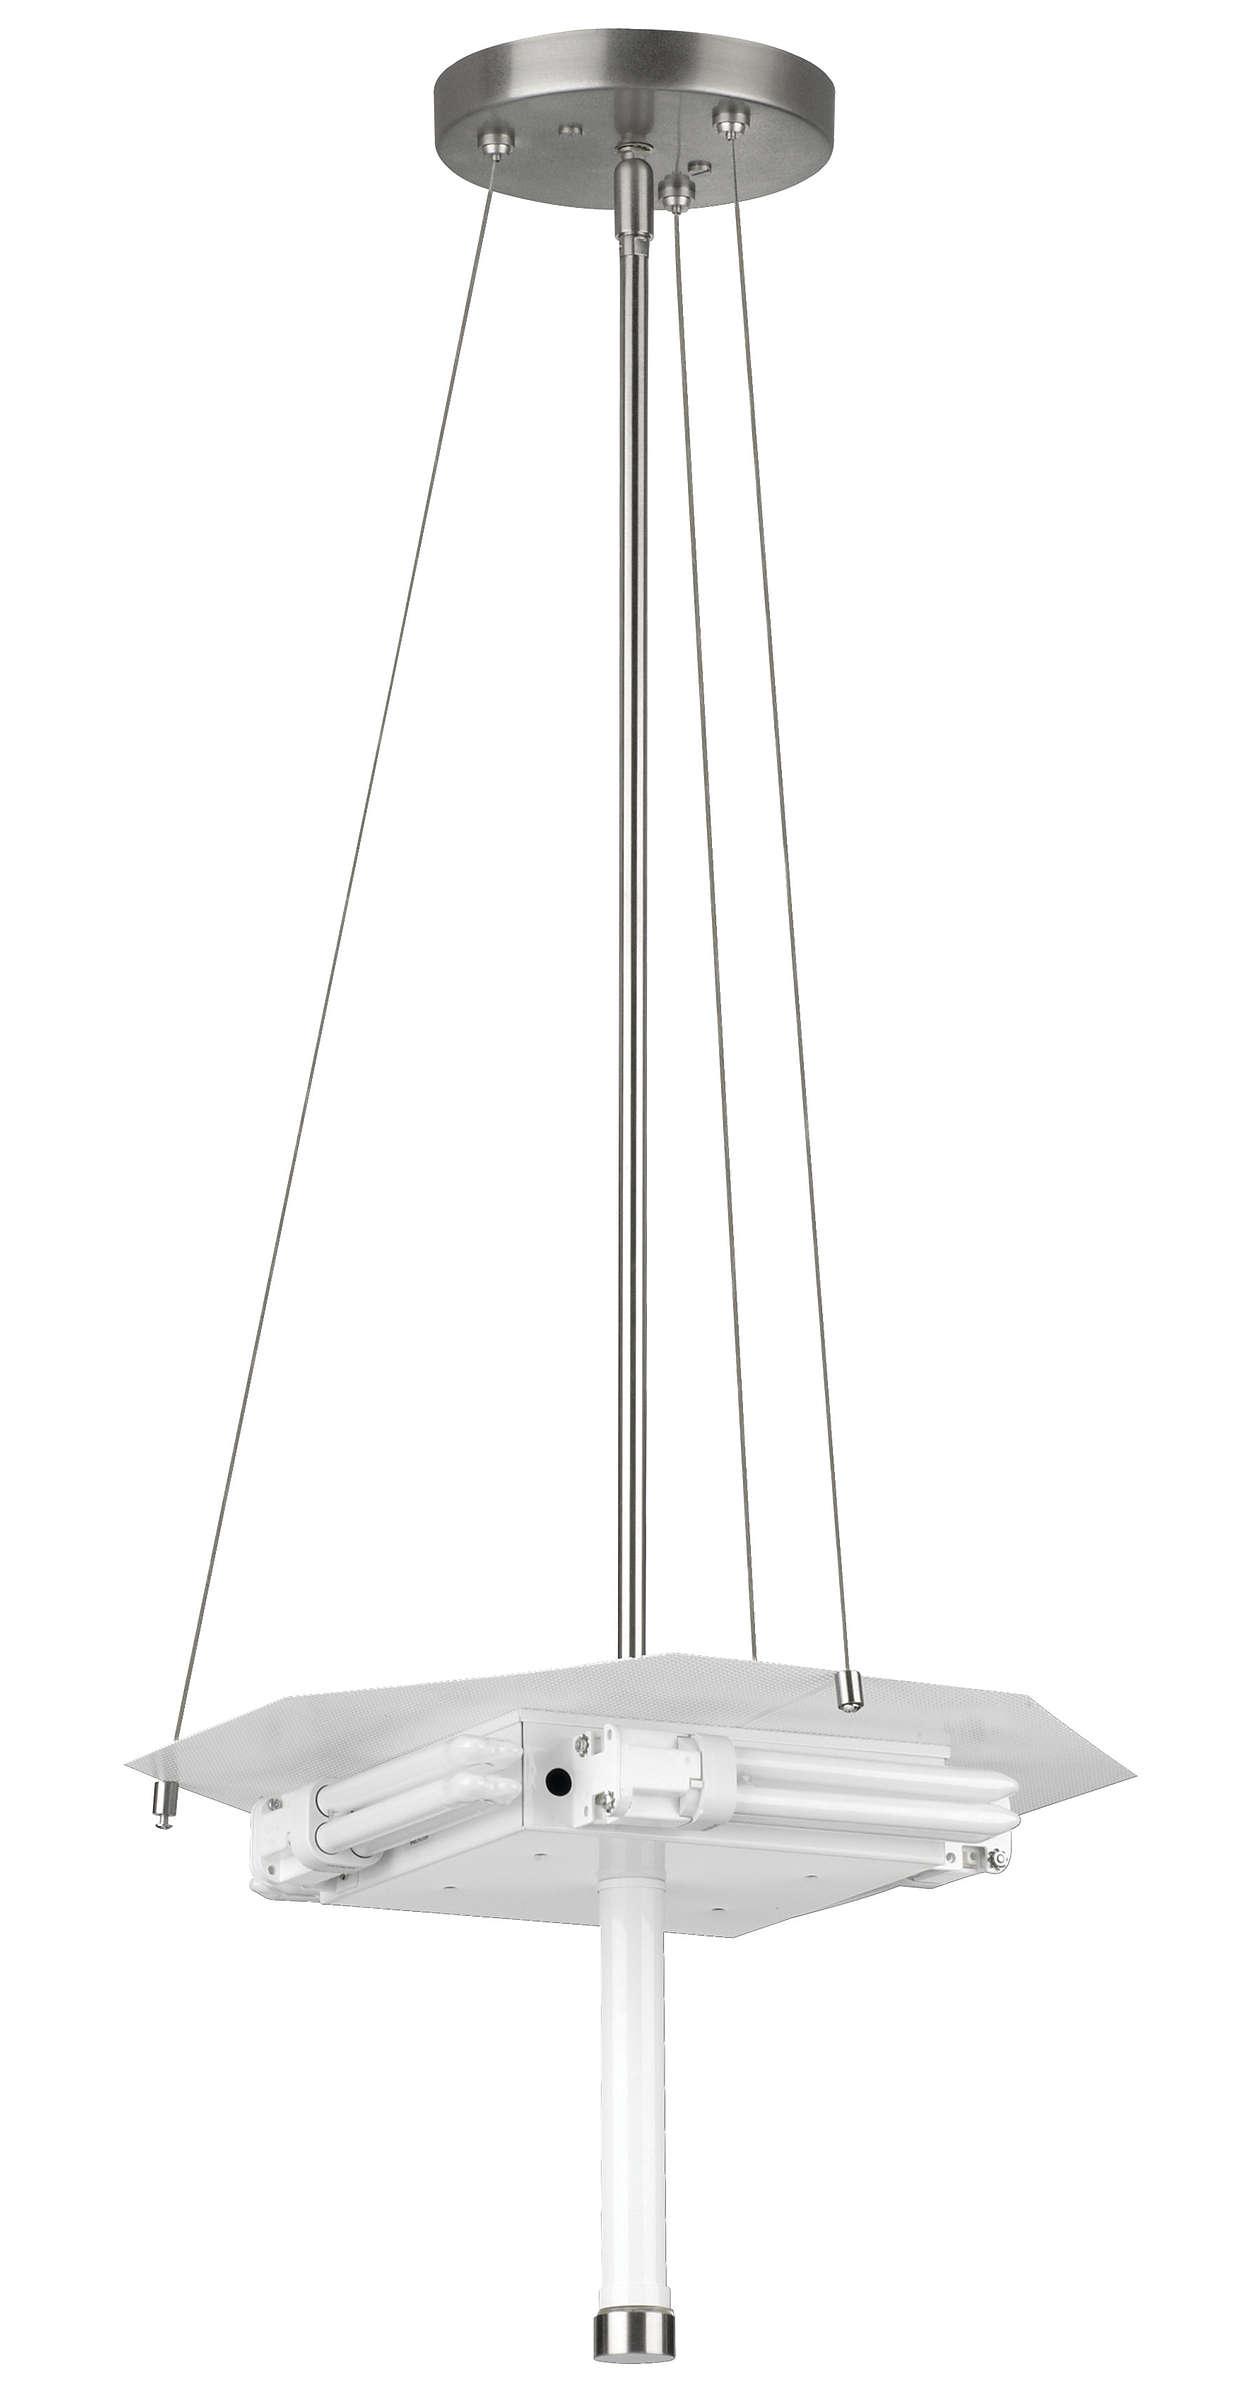 Taylor 4-light Pendant in Satin Nickel finish